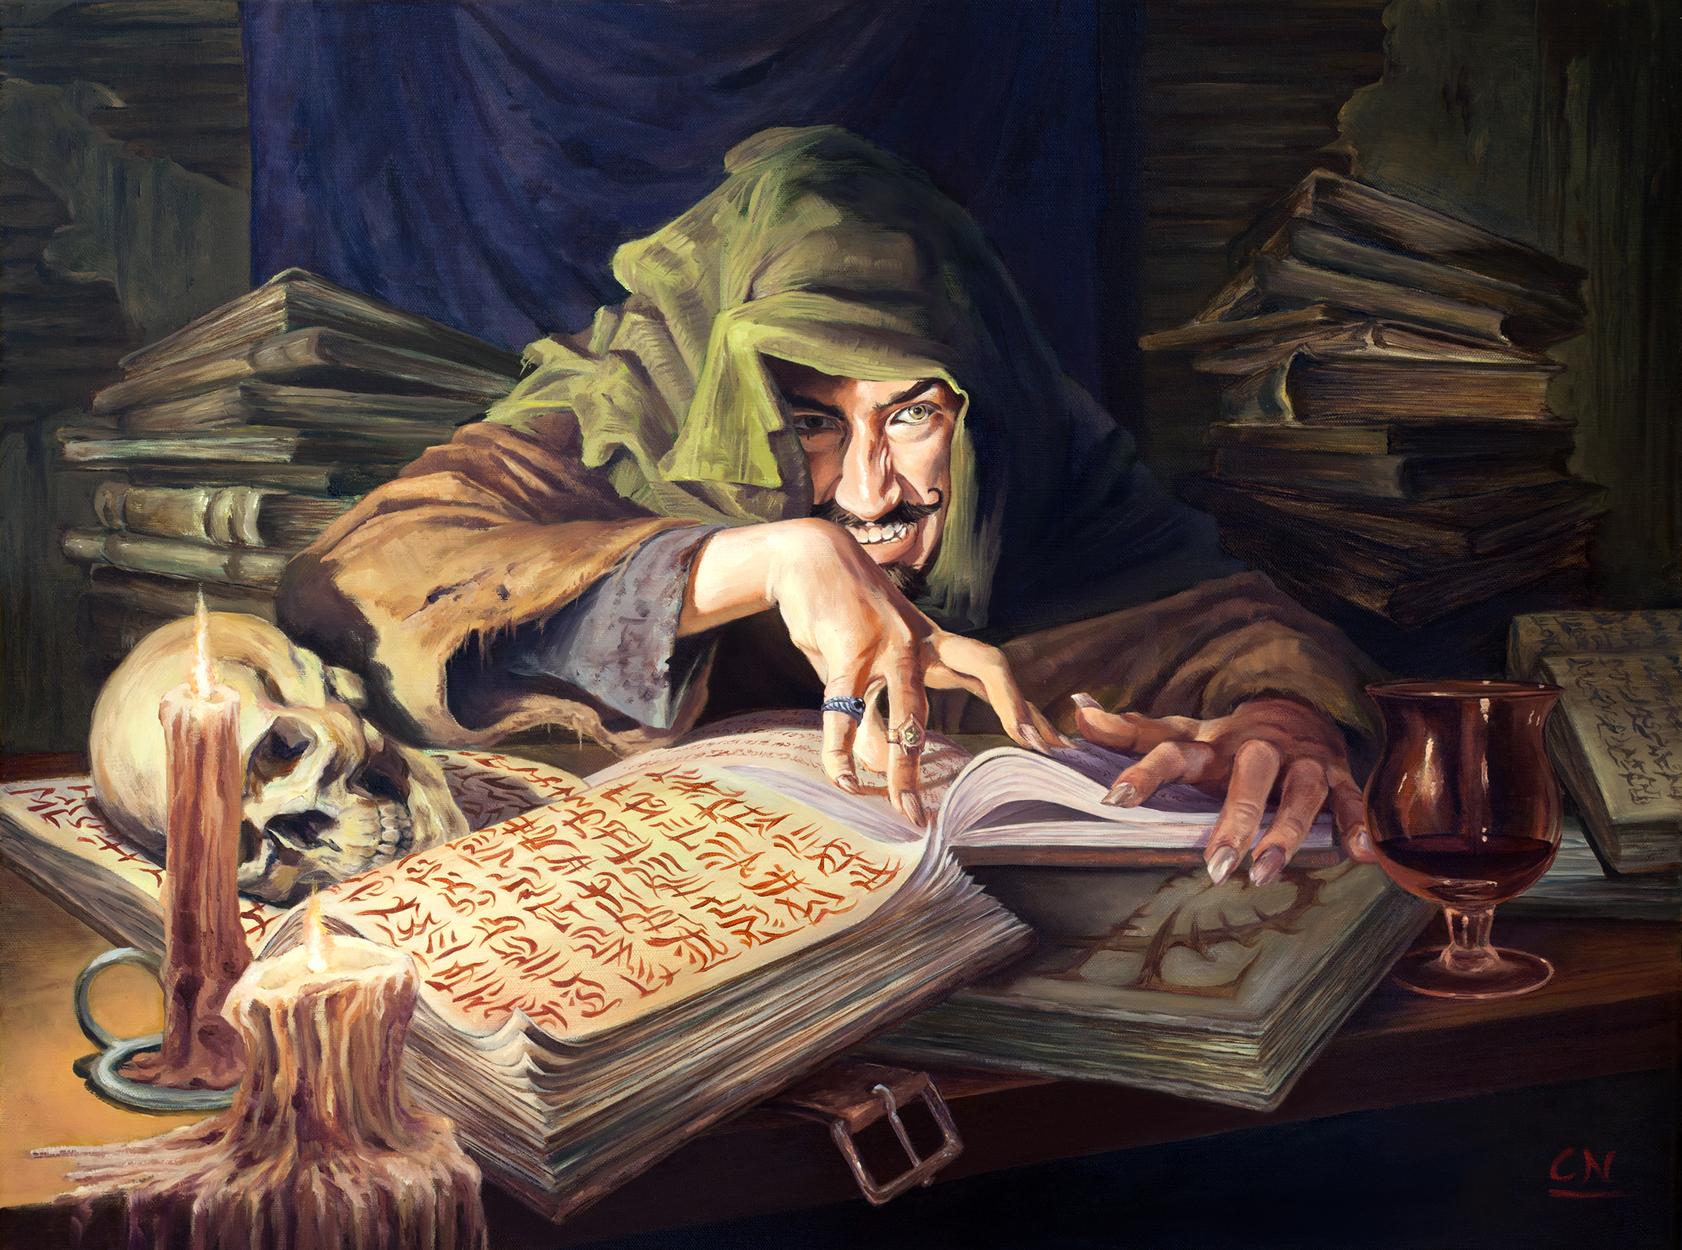 Forbidden Knowledge Artwork by Colin Nitta